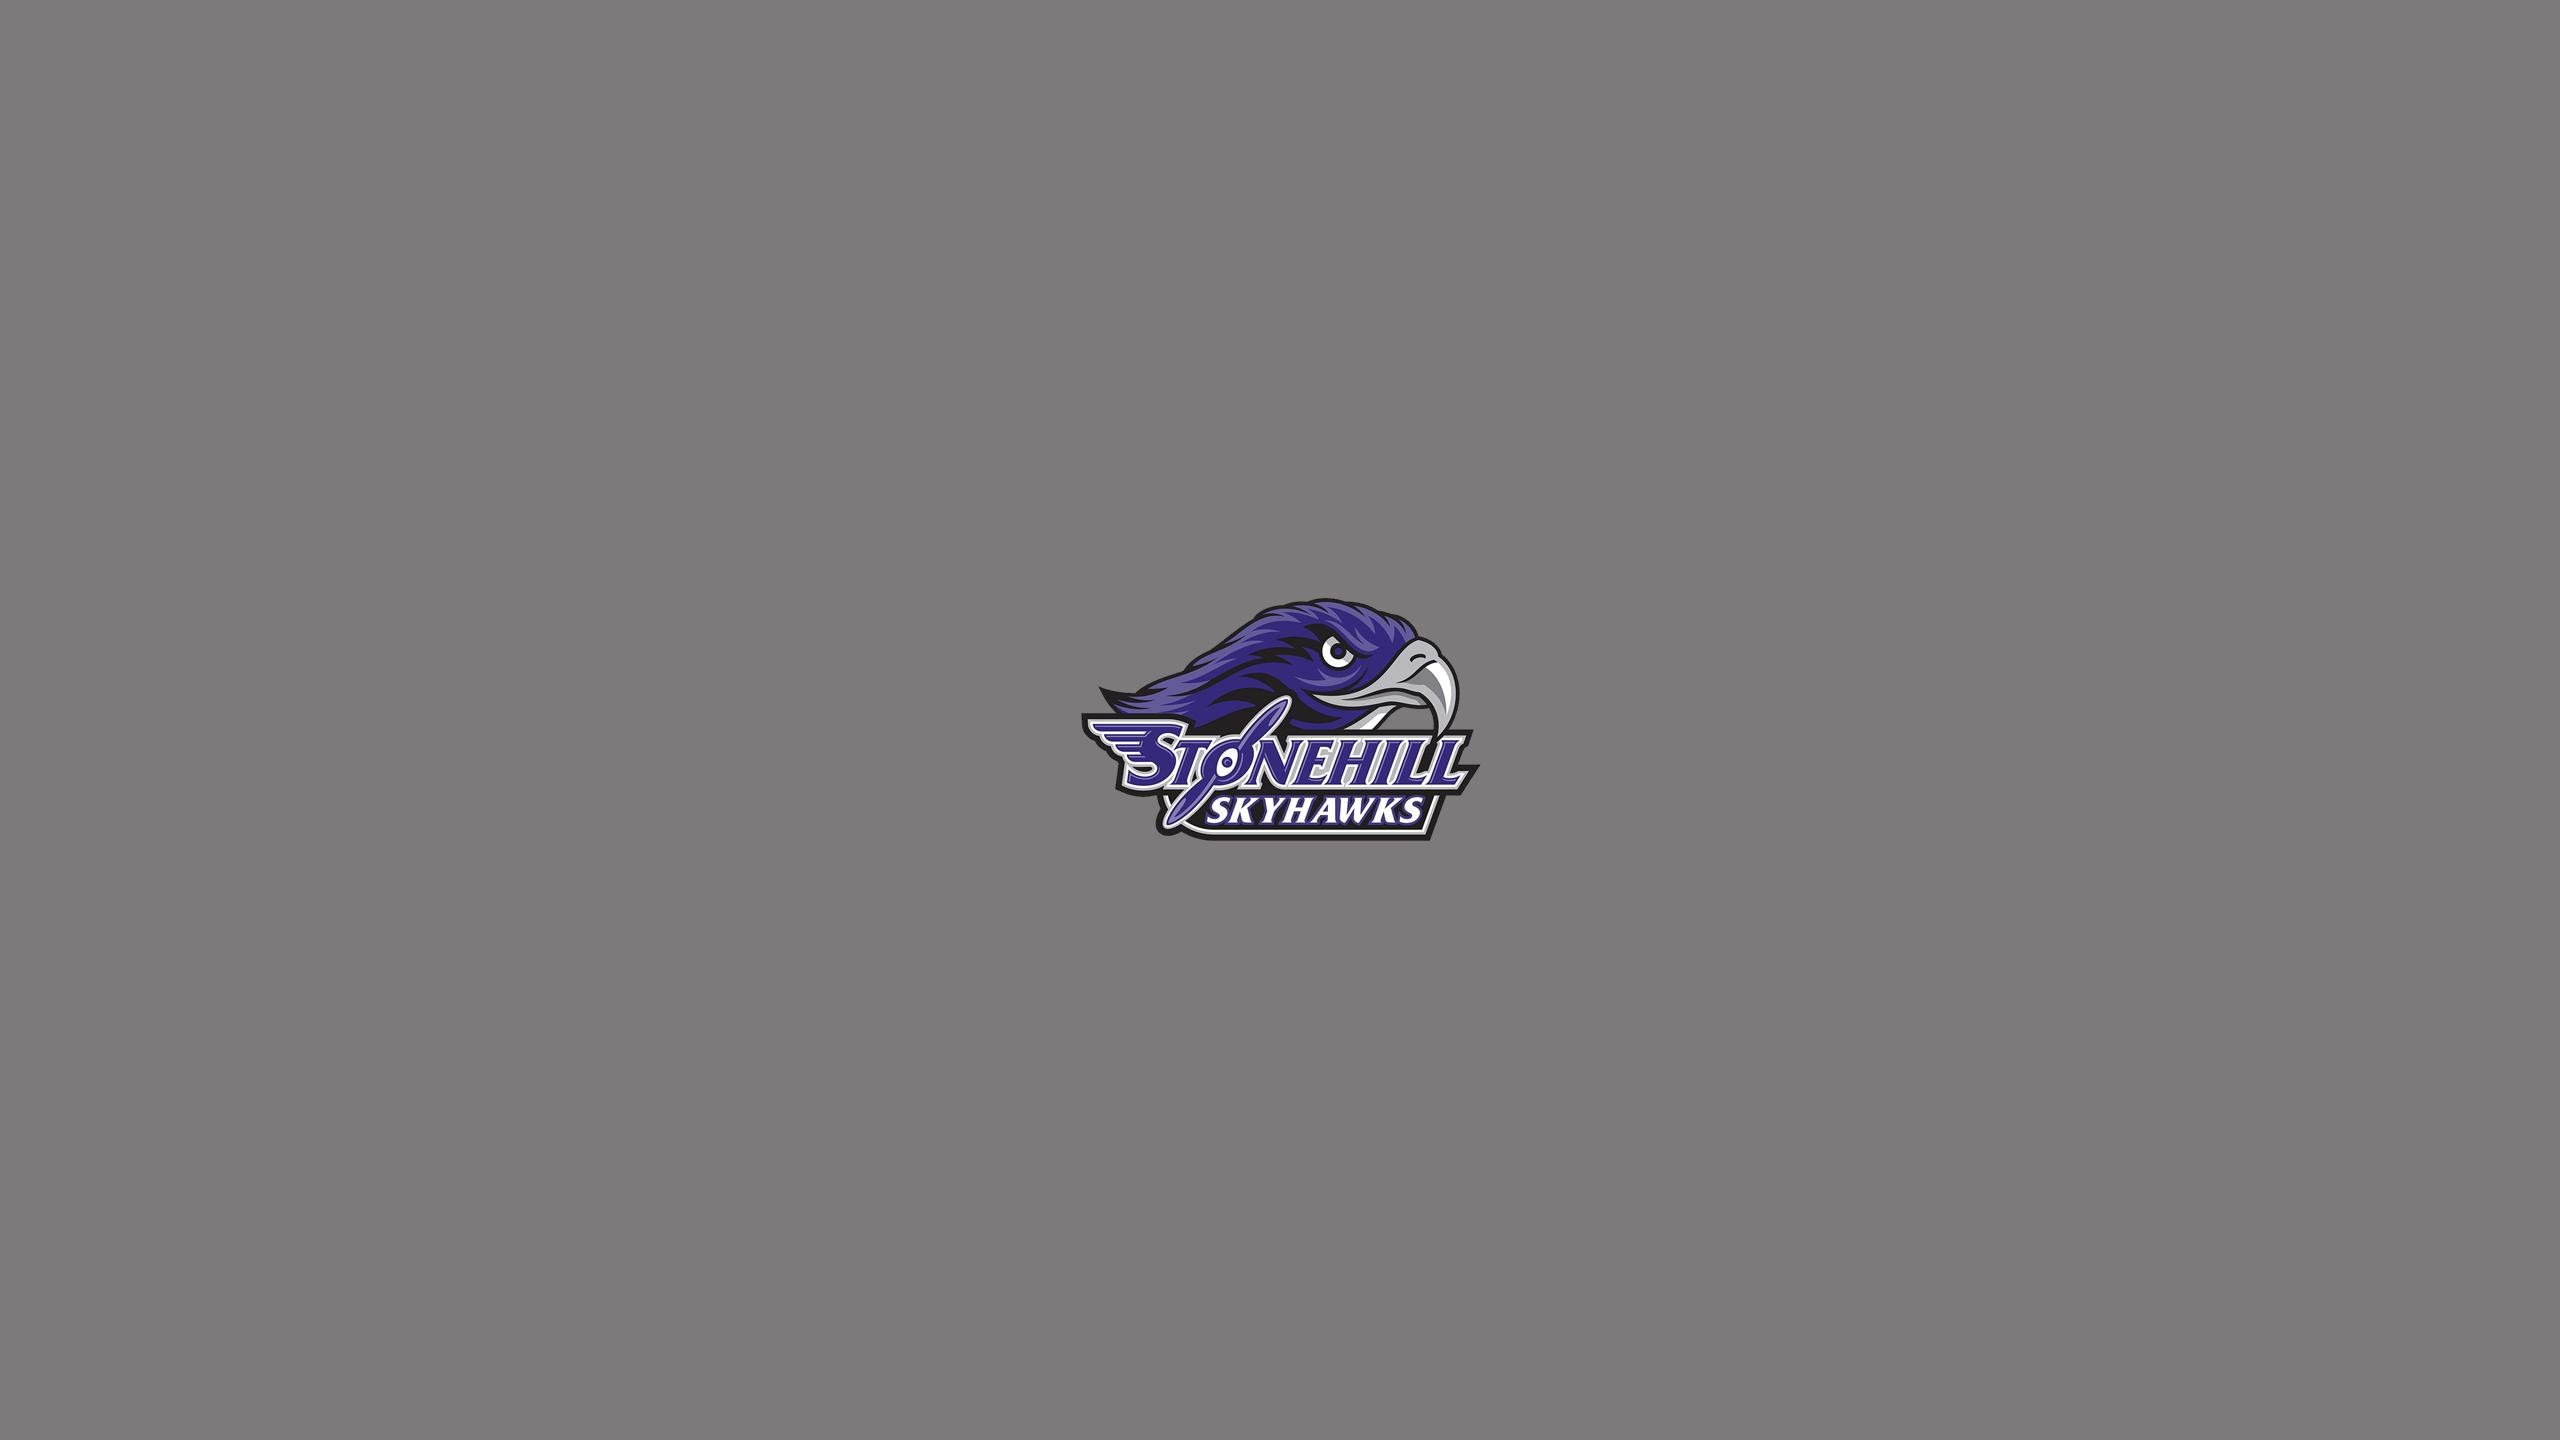 Stonehill College (MA) Skyhawks